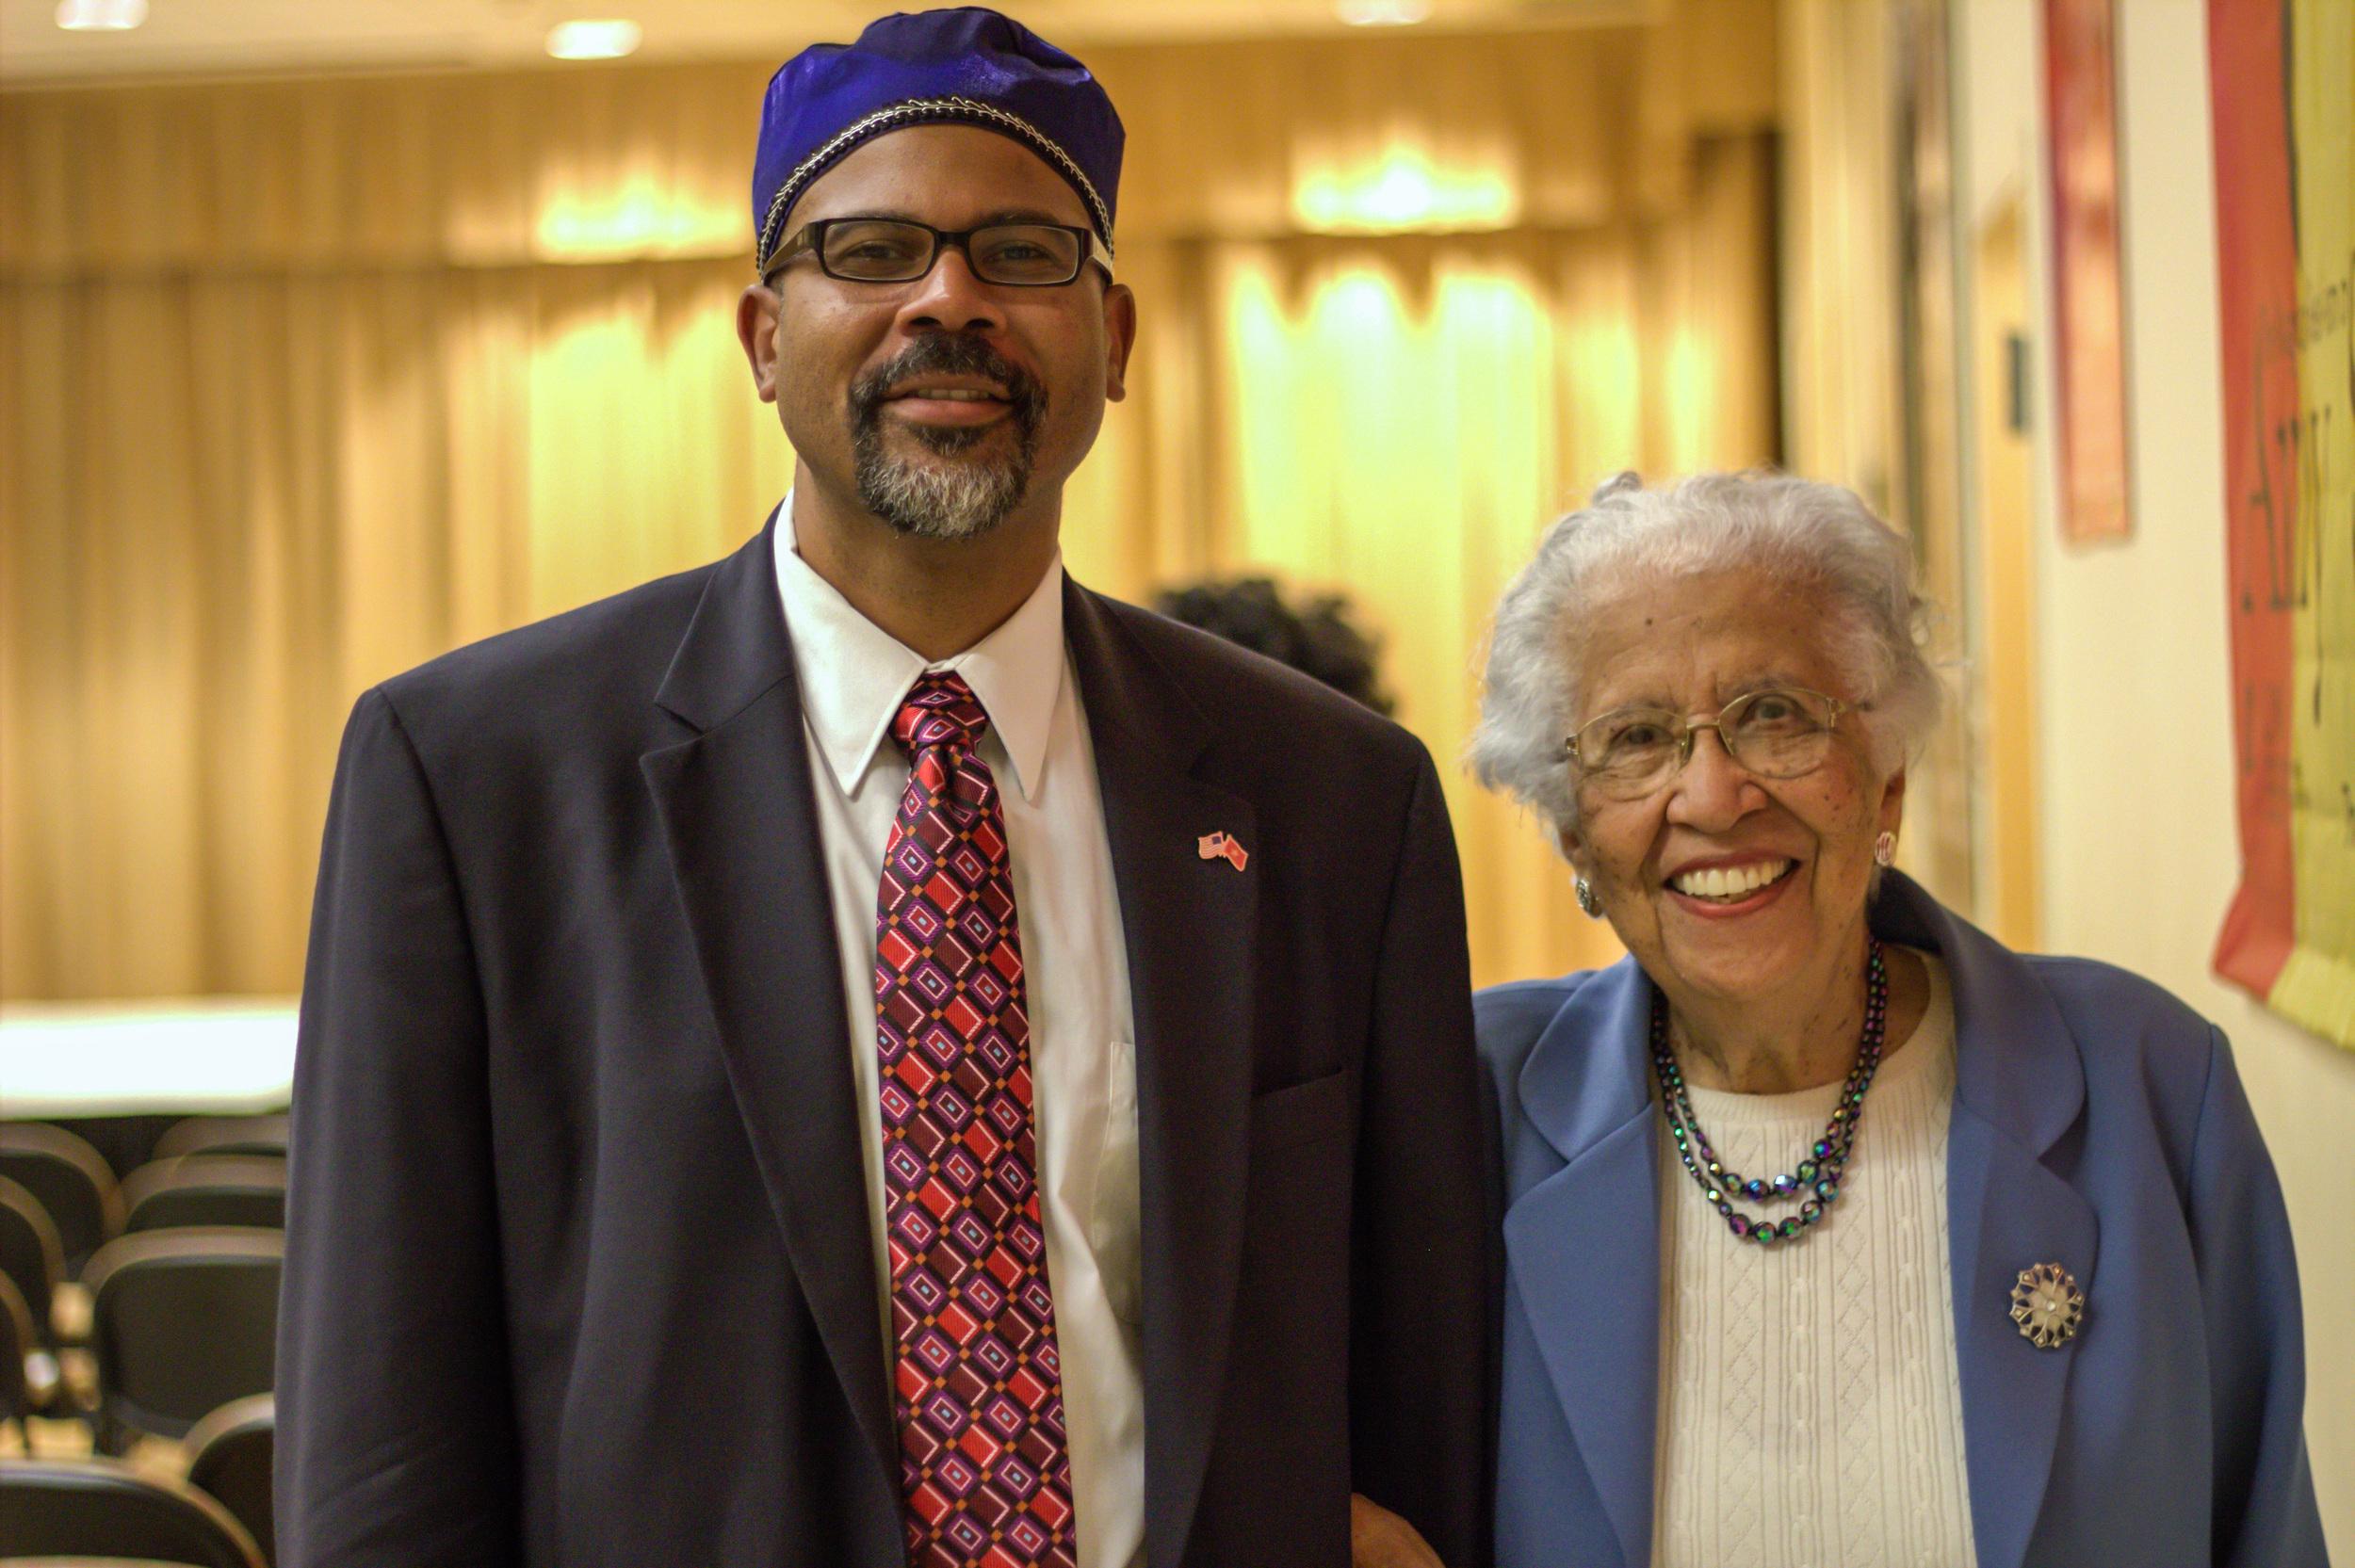 Hortense McClinton with son of Dr. Sonja Haynes Stone